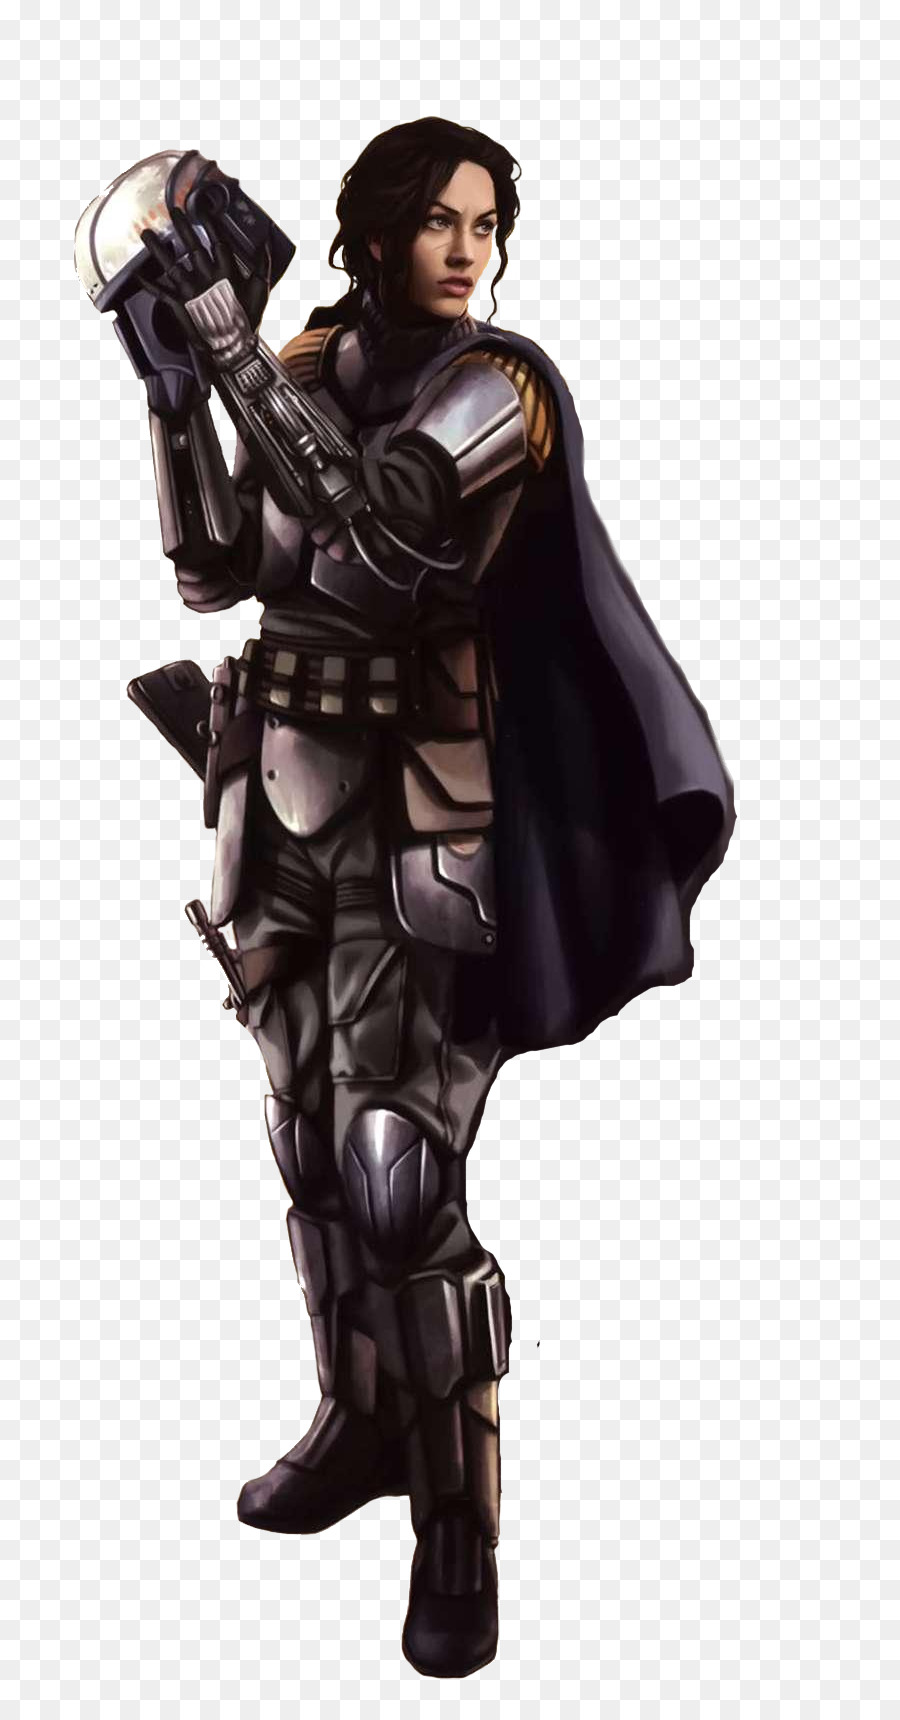 https://banner2.kisspng.com/20180422/hbq/kisspng-star-wars-roleplaying-game-star-wars-bounty-hunte-urban-women-5add2dce5cc752.15306970152444462238.jpg